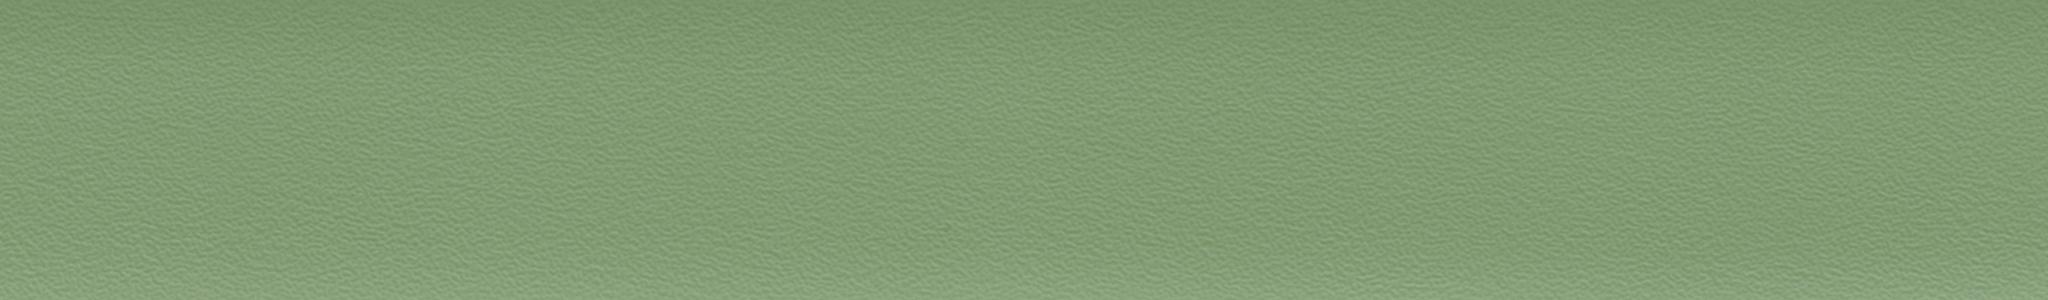 HU 16635 ABS Kante UNI Moosgrün perl 101